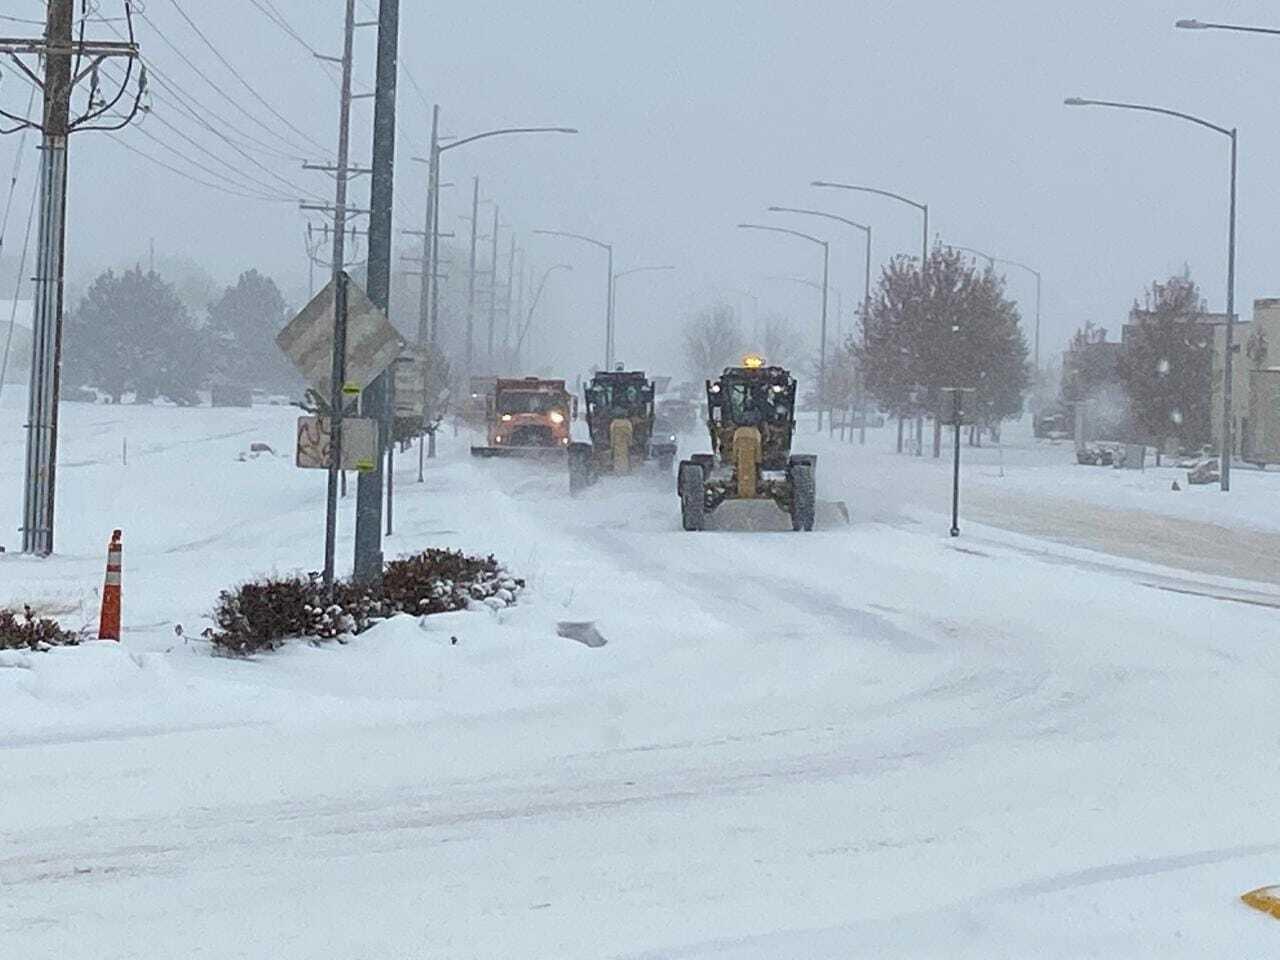 Billings Snow Plow